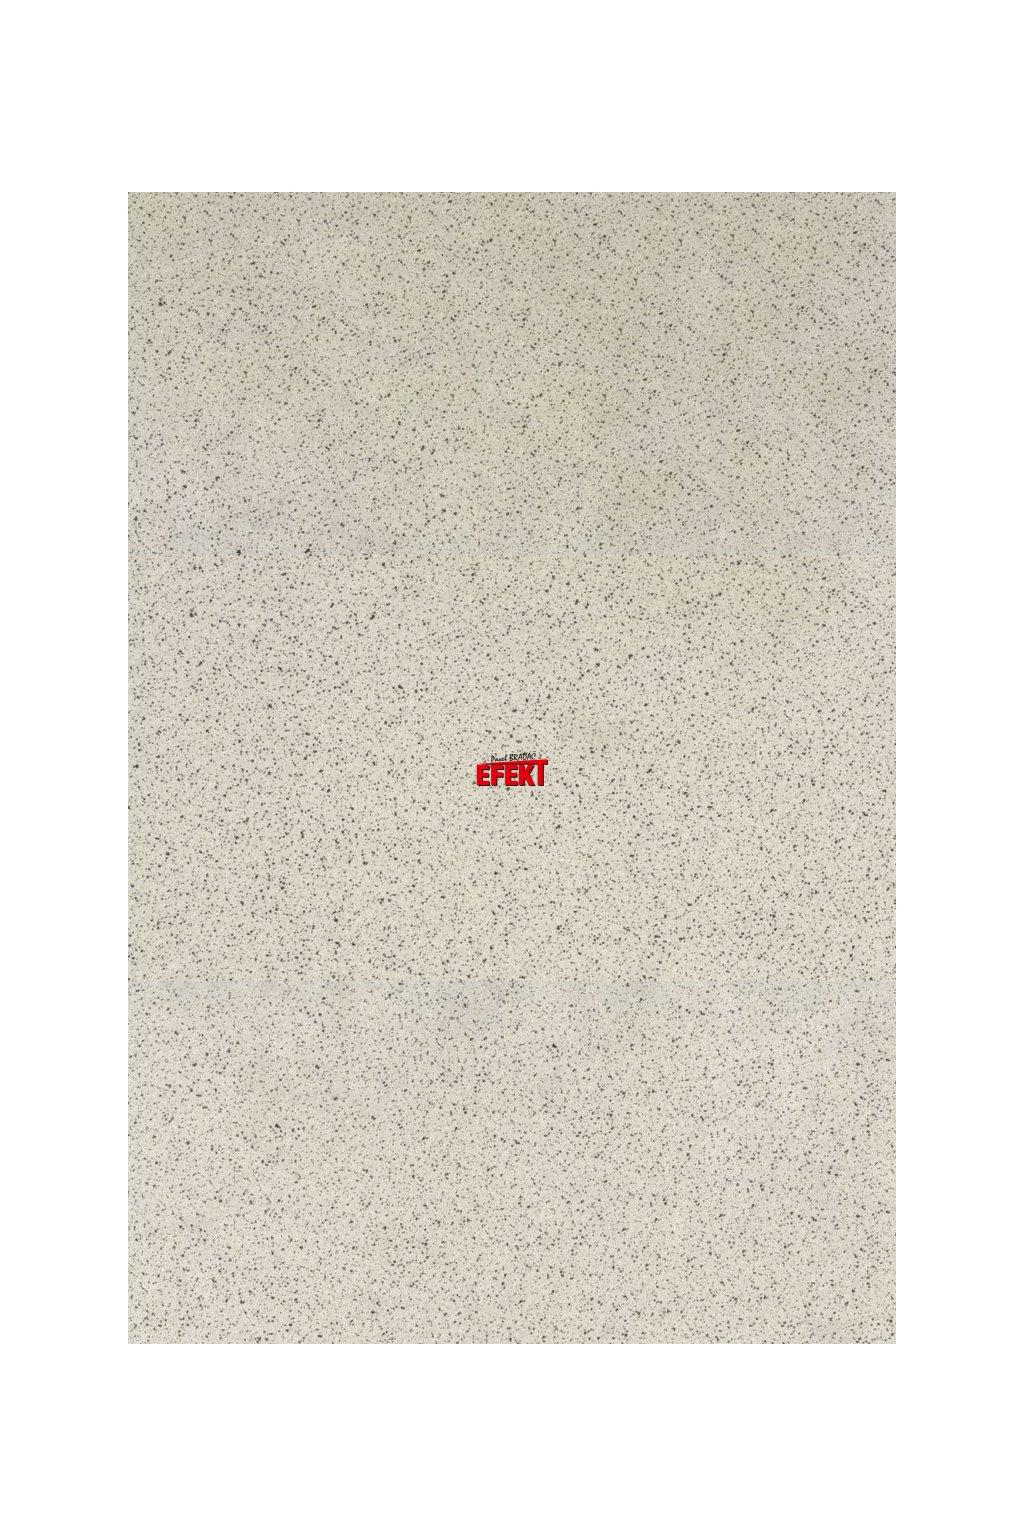 Gerflor Timberline Pixel Clear 2175